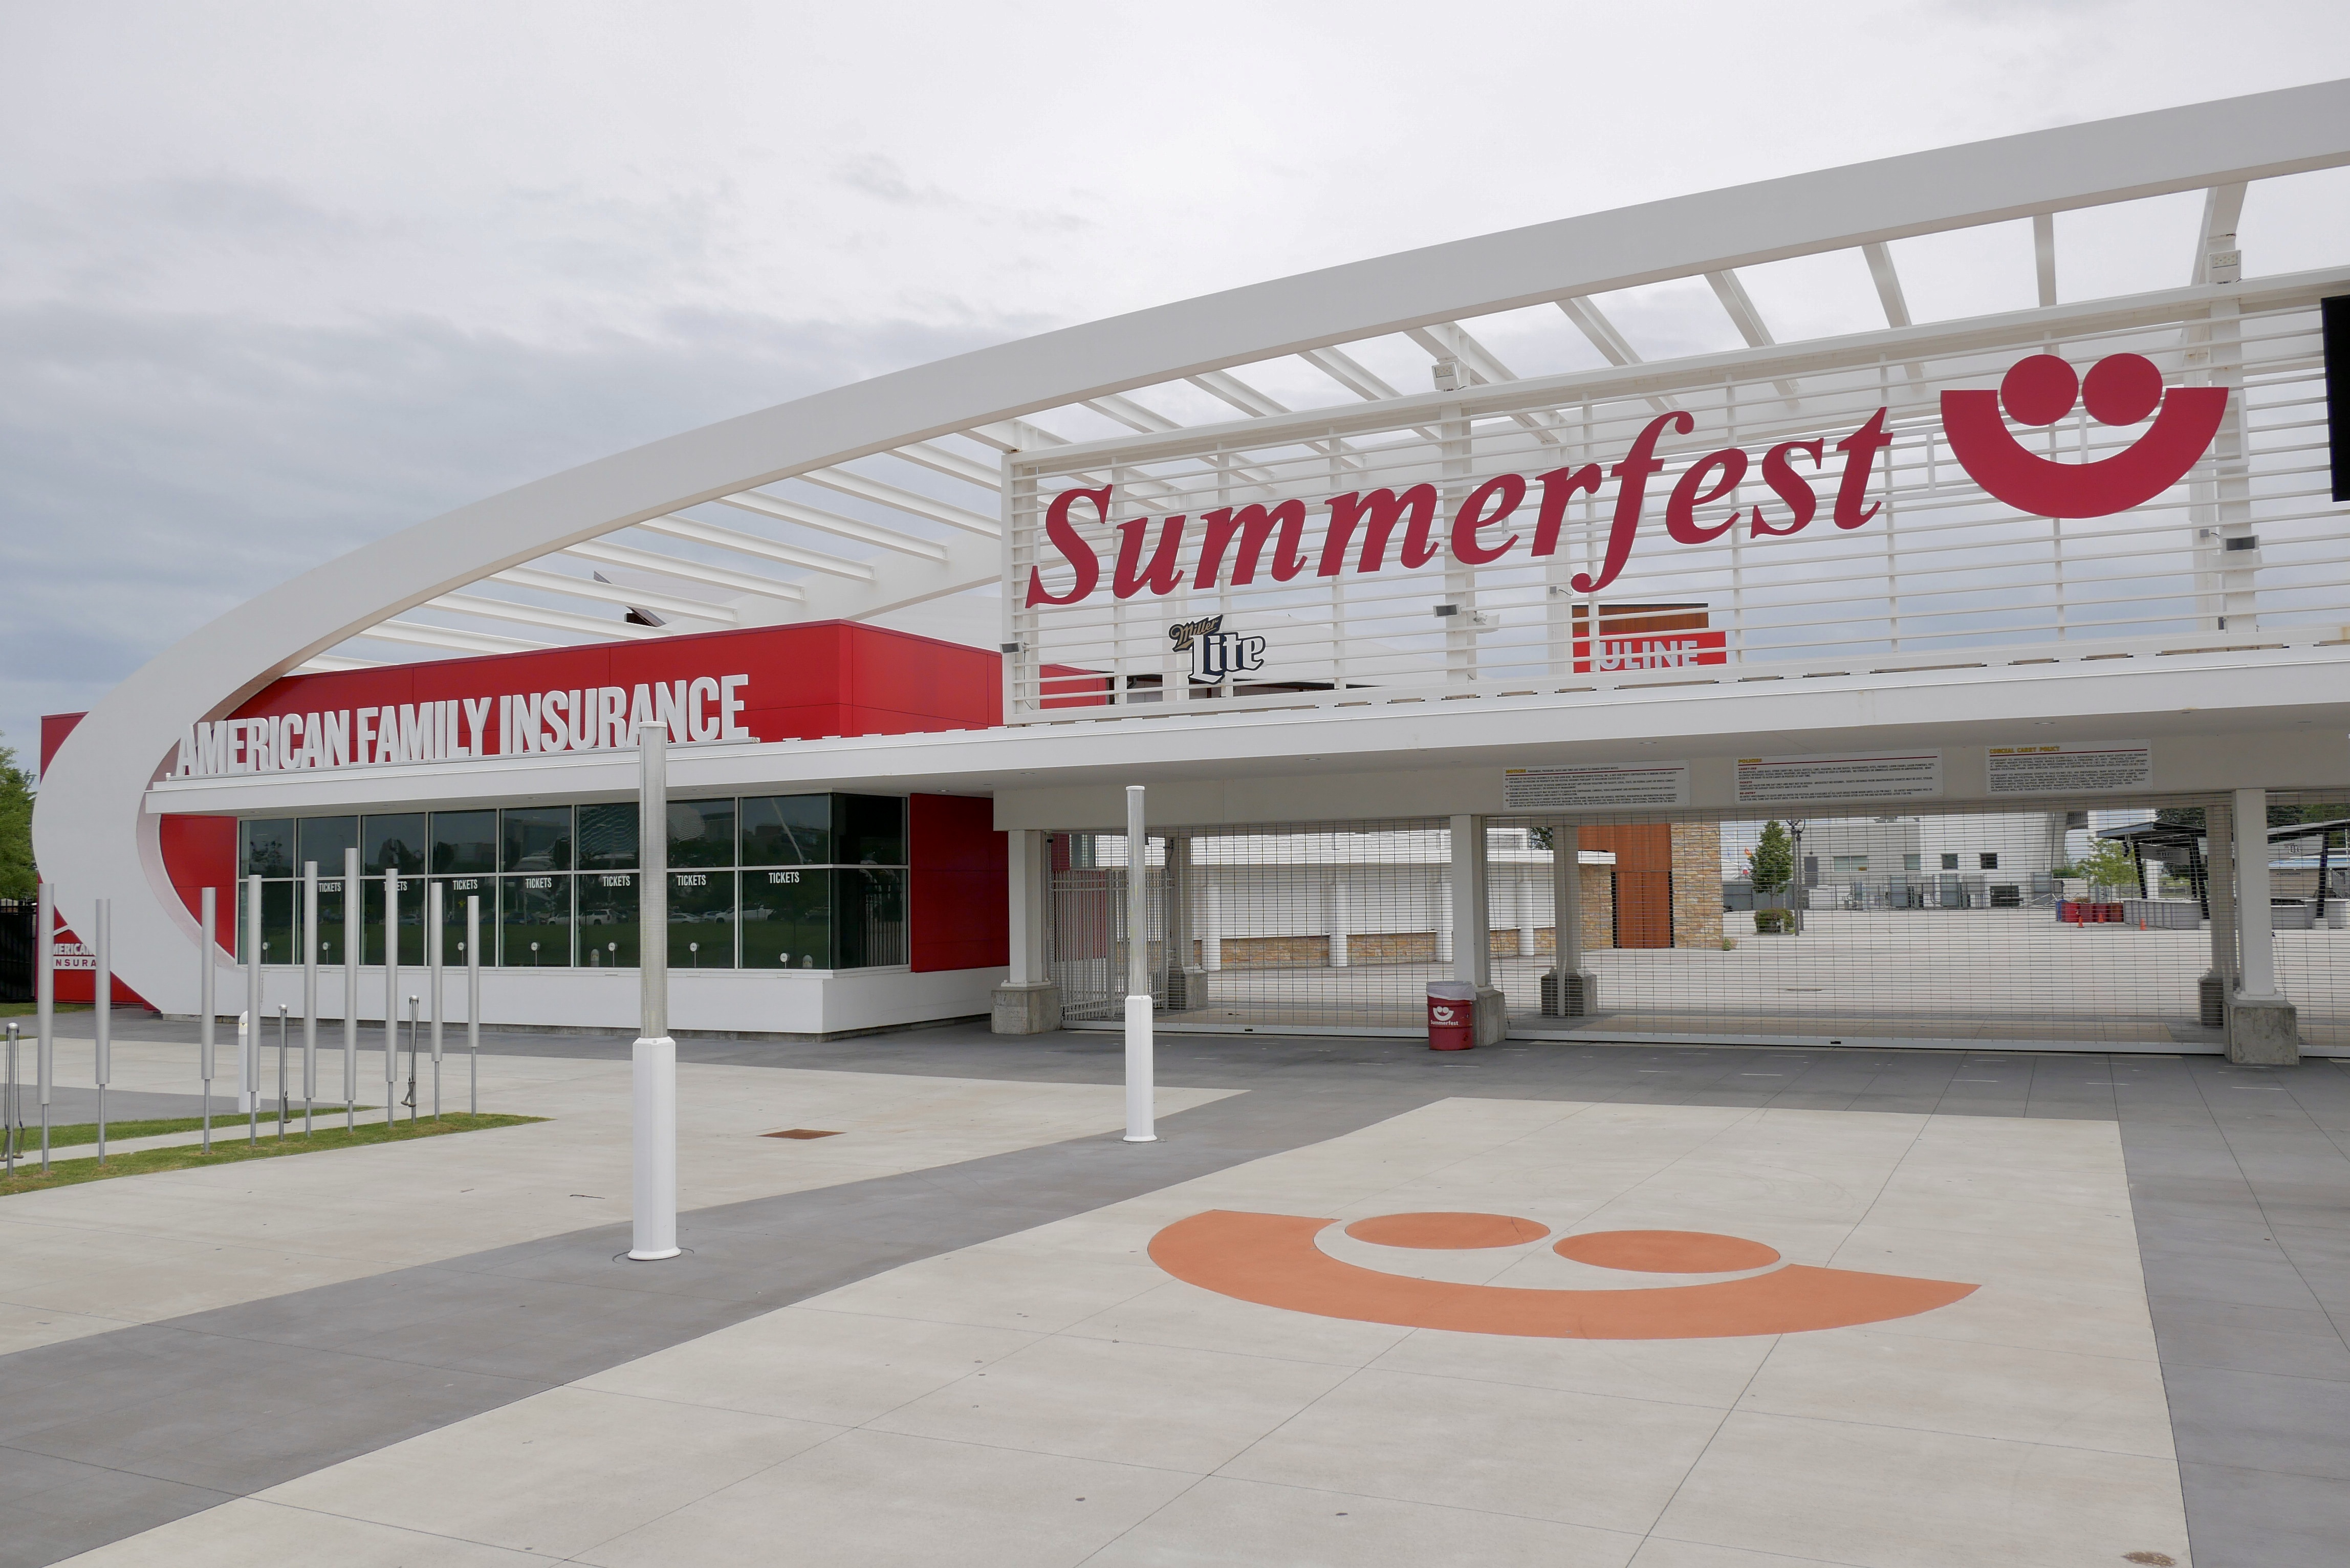 Summerfest music festival grounds